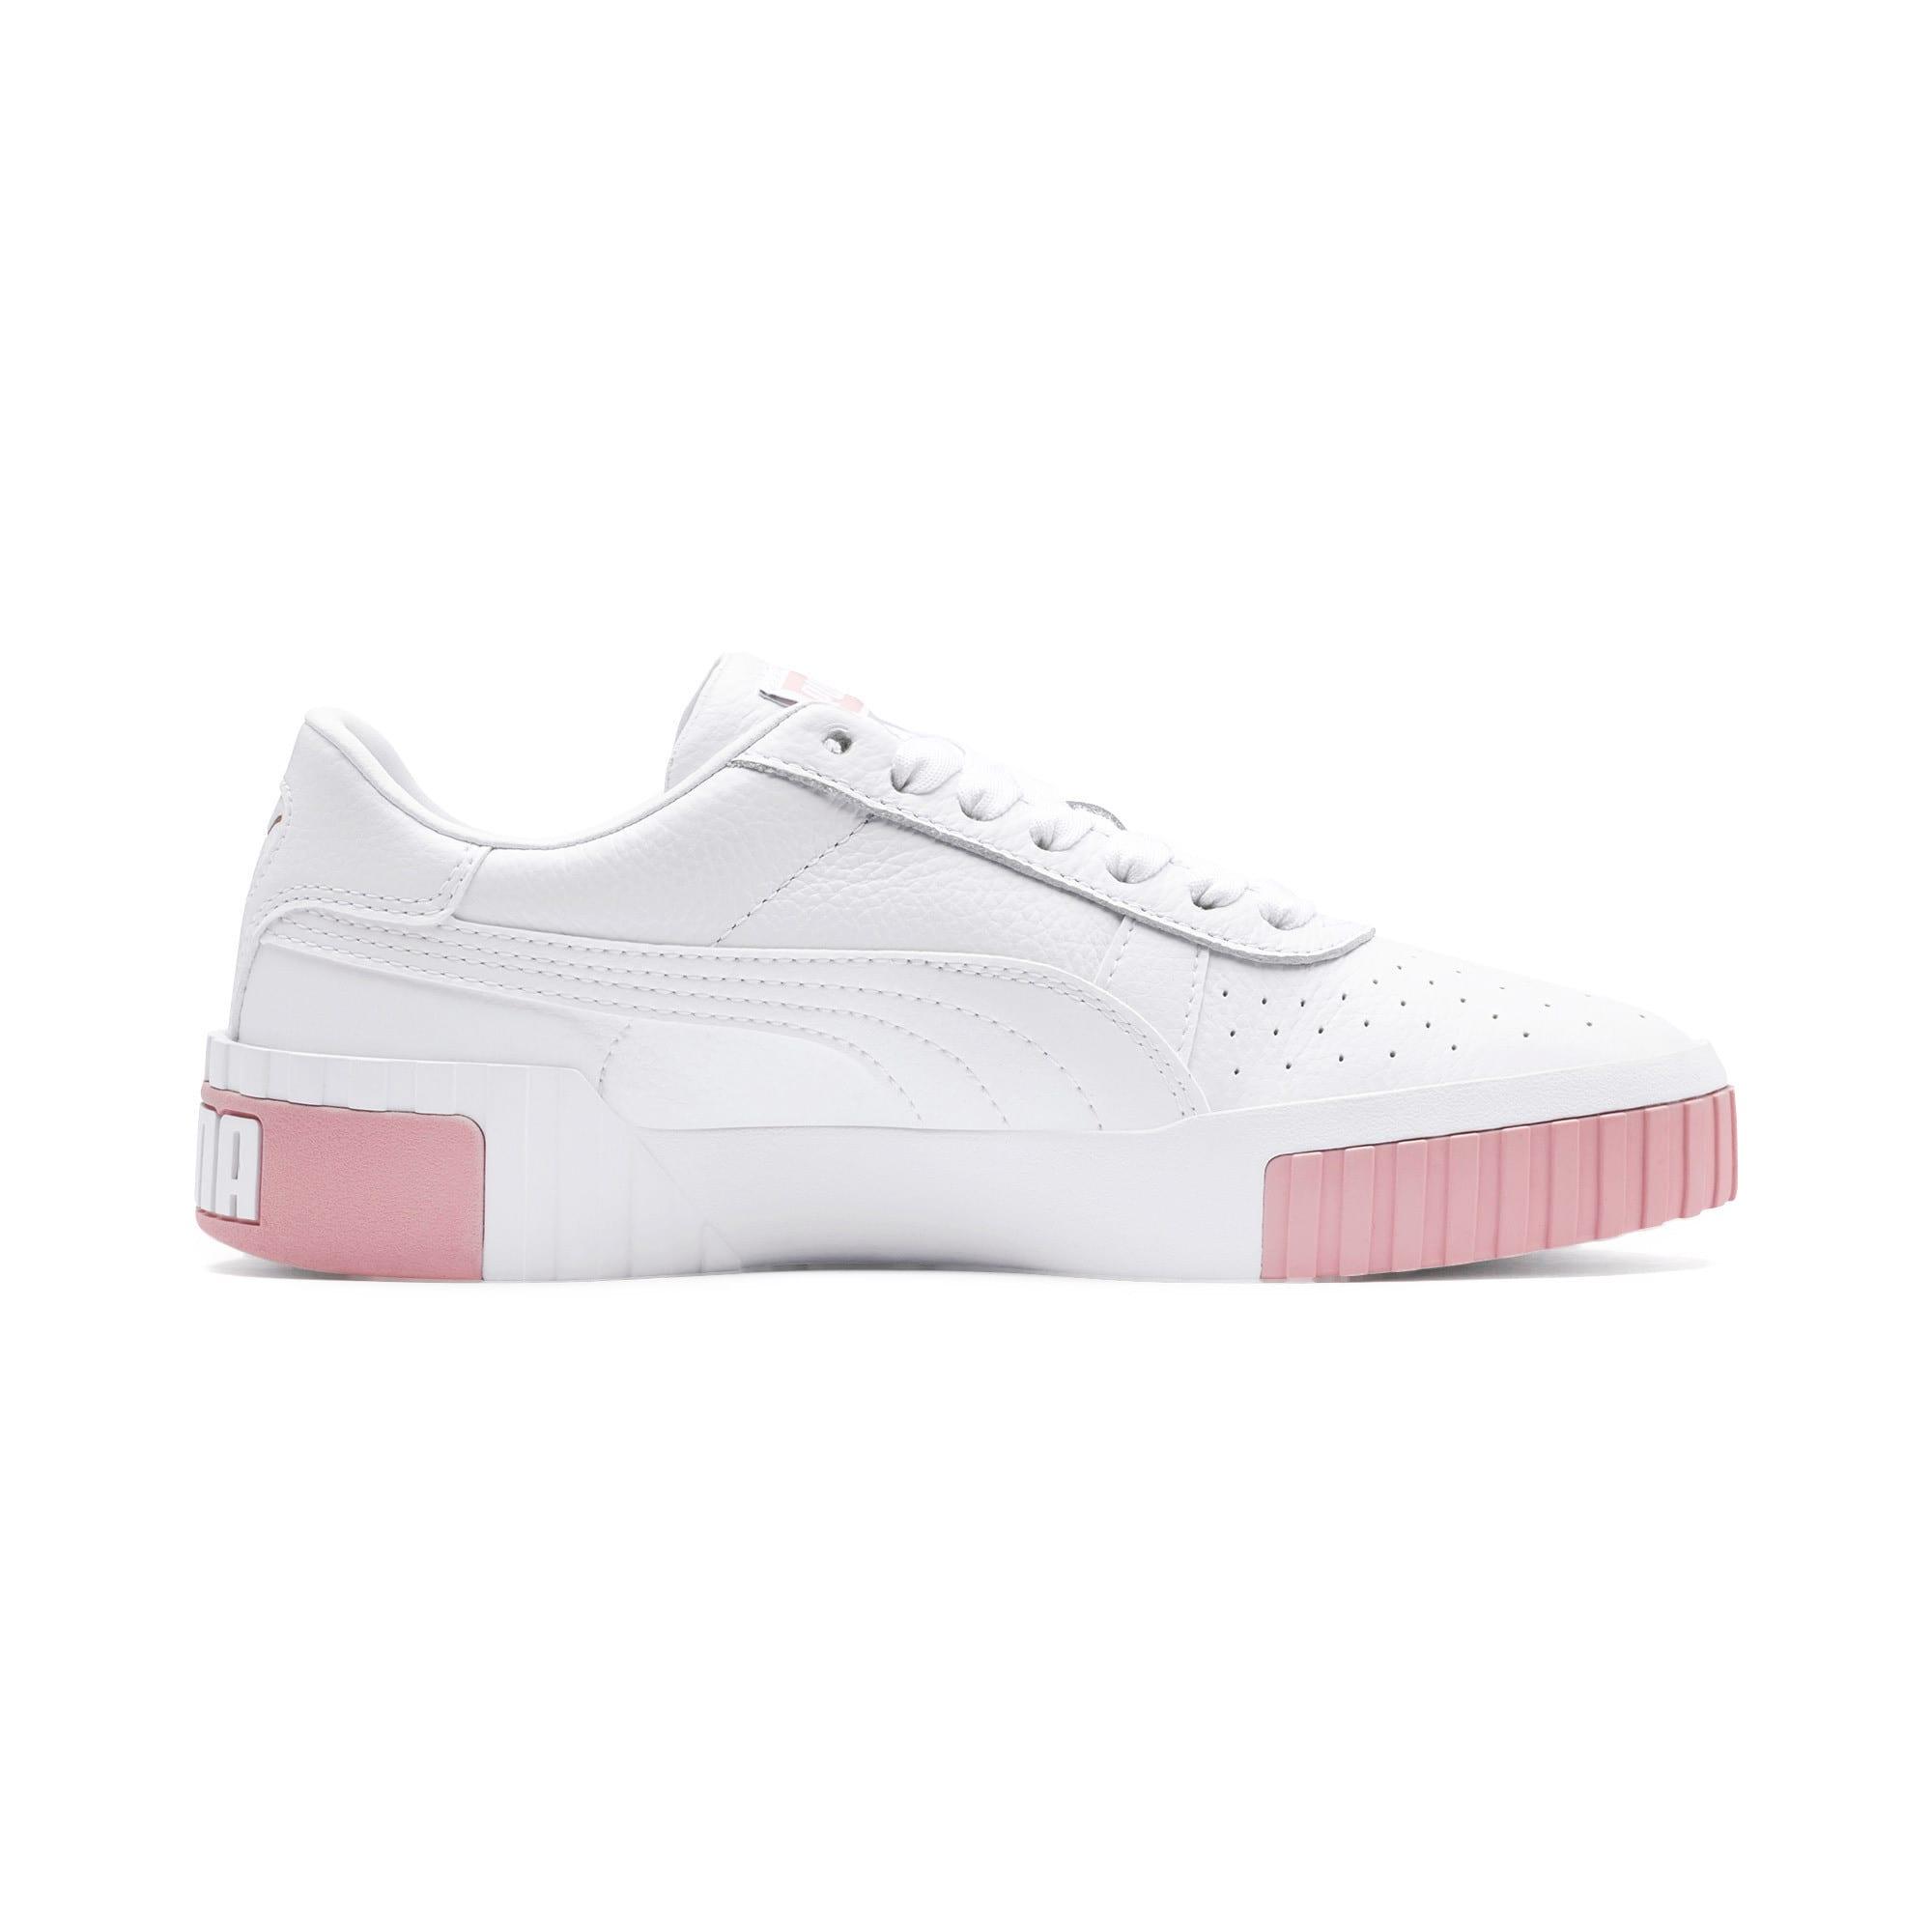 Thumbnail 6 of Cali Women's Sneakers, Puma White-Rose Gold, medium